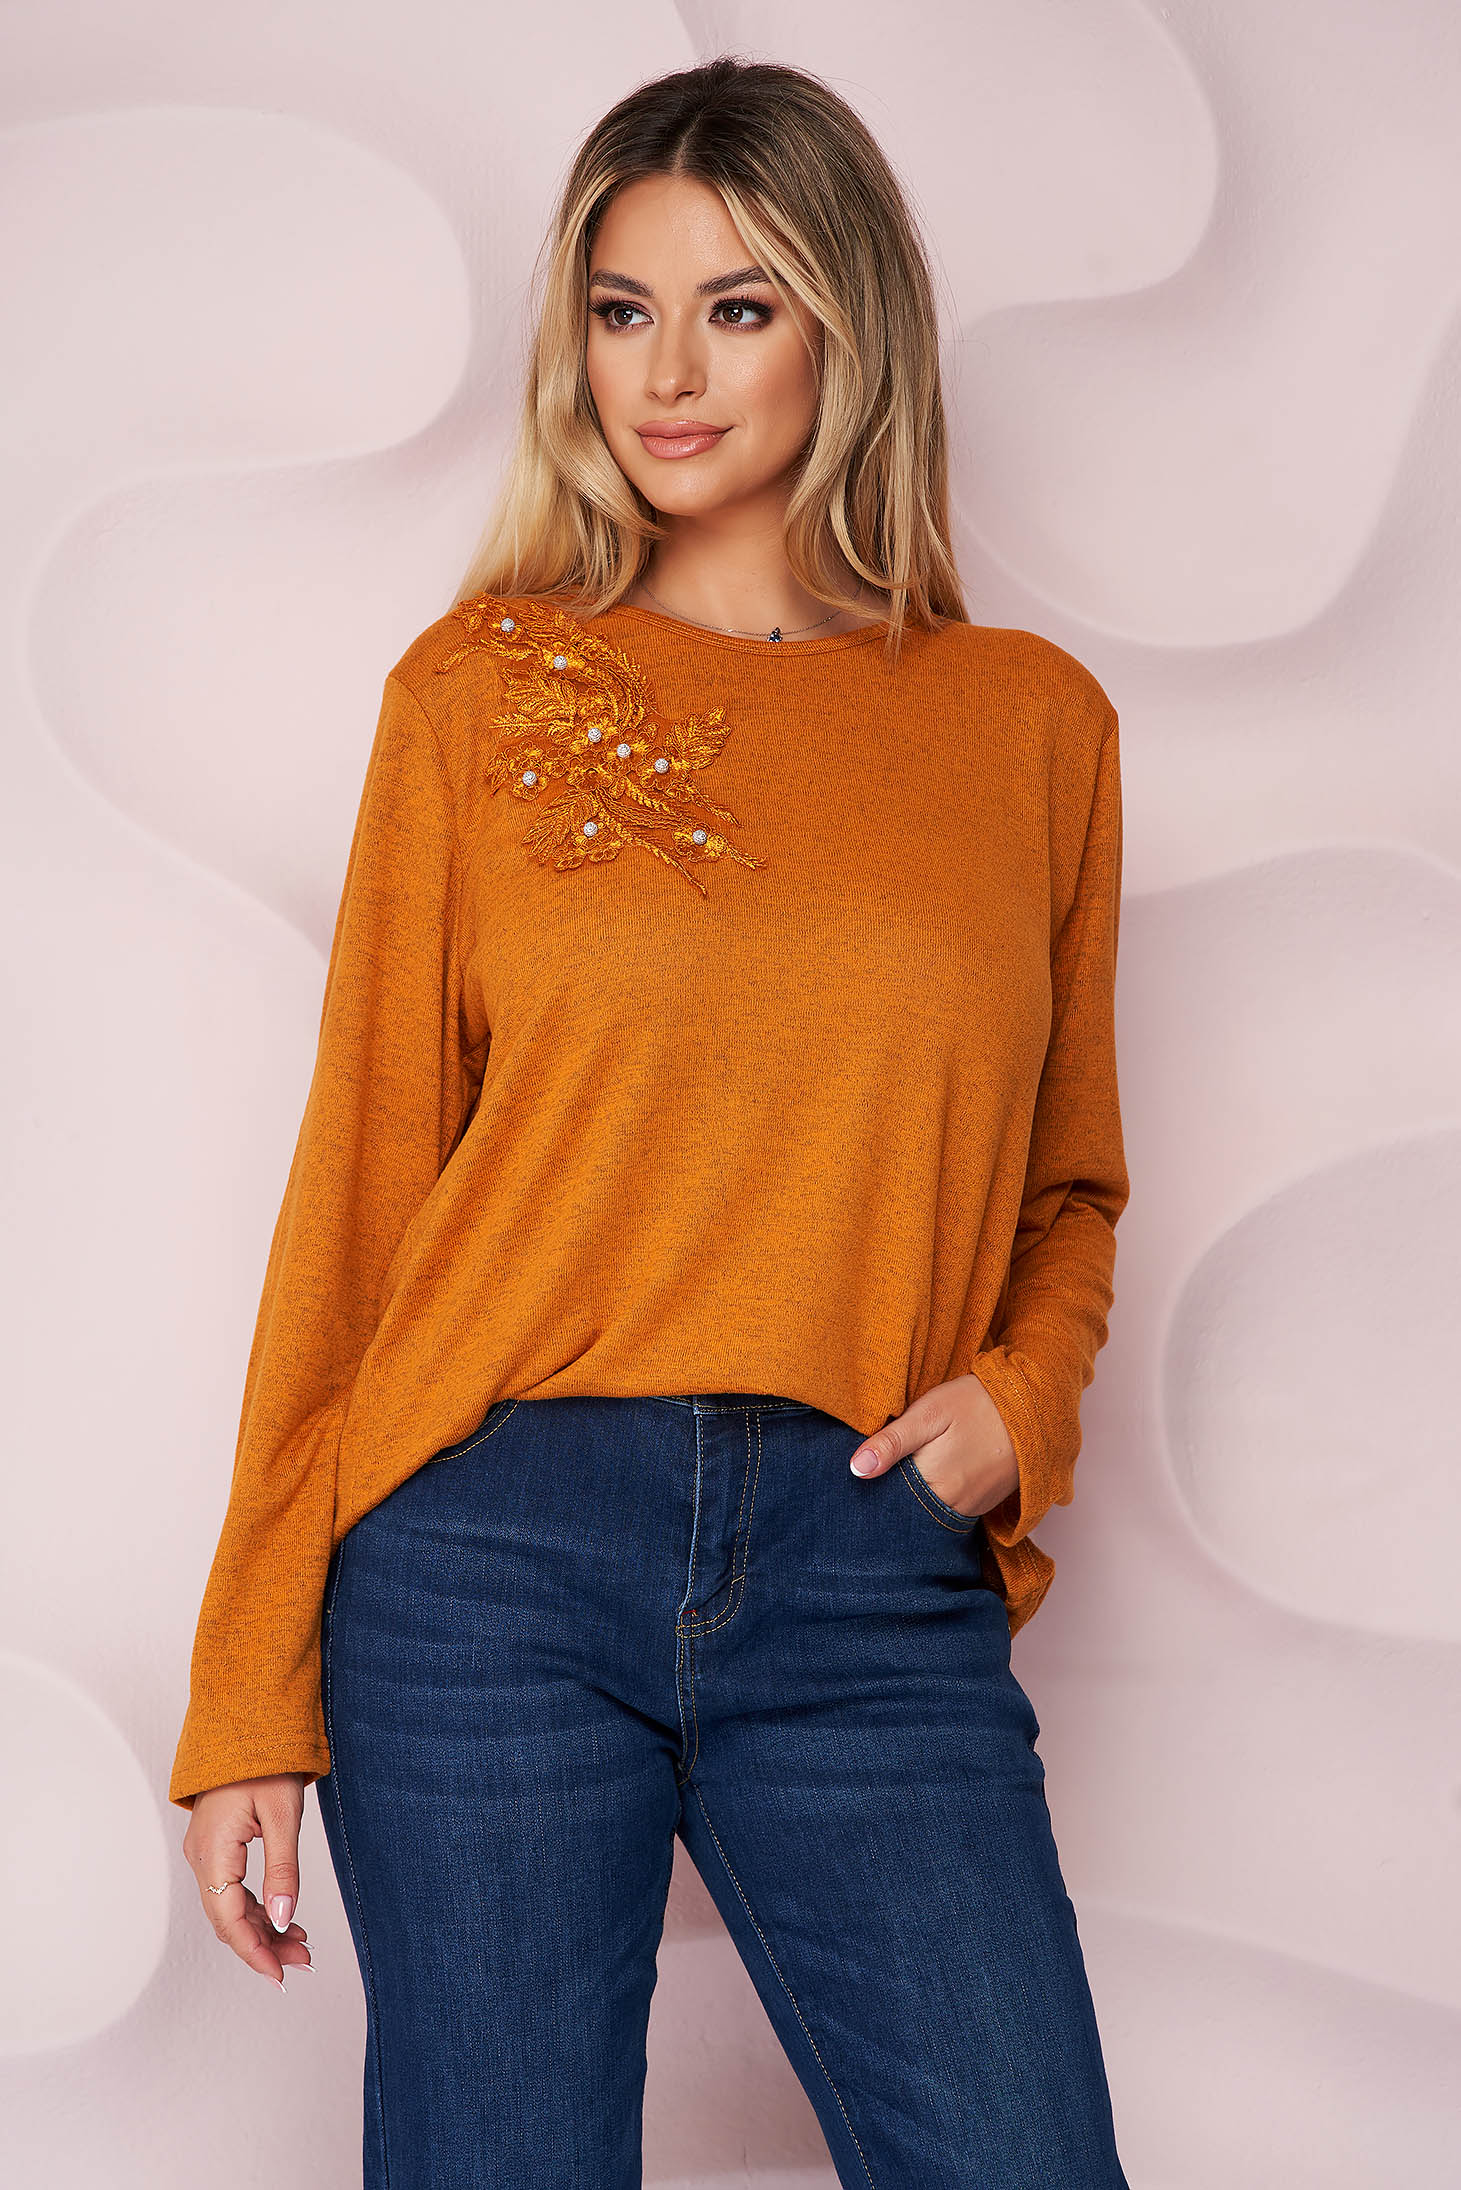 Pulover Lady Pandora portocaliu office cu croi larg din material tricotat elastic si subtire si broderie florala